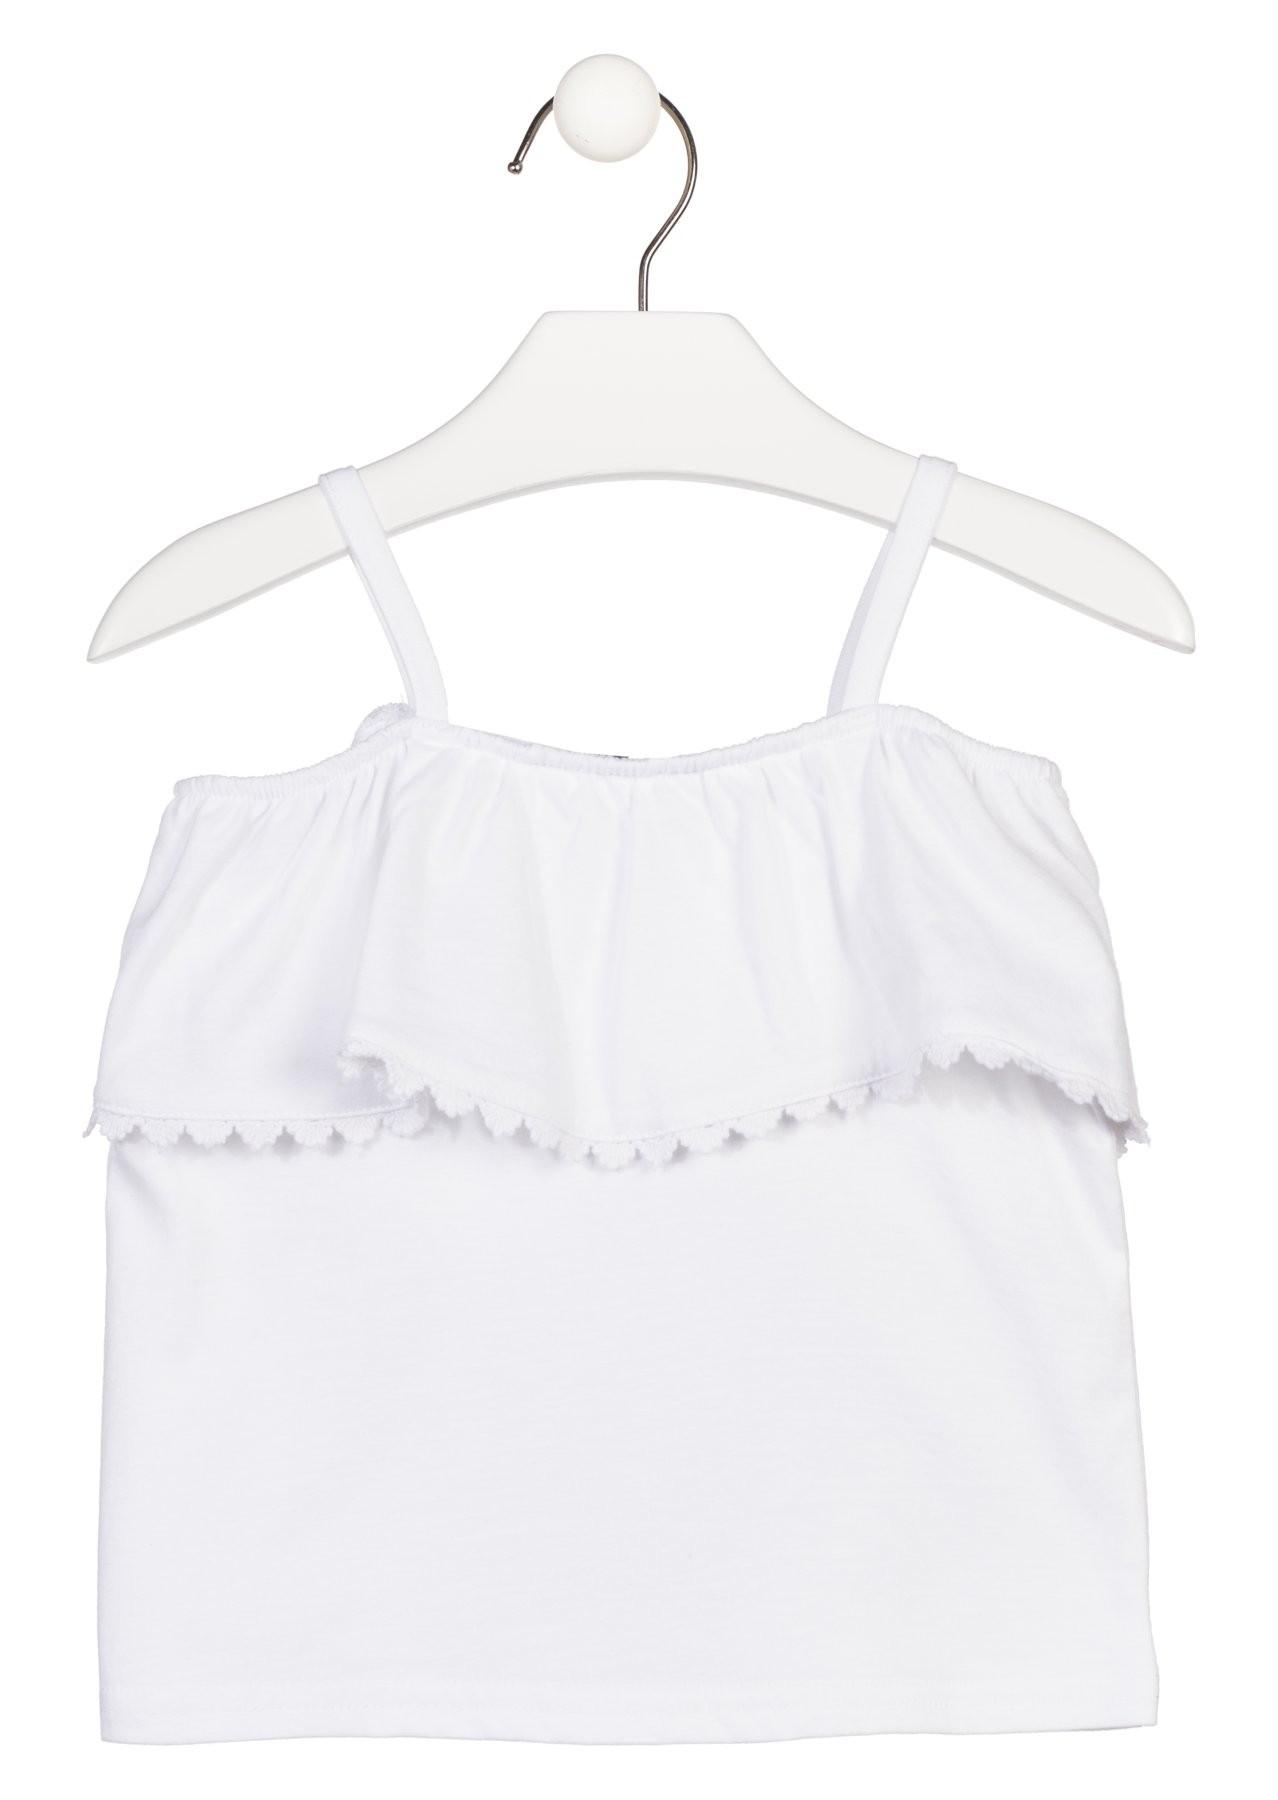 094750eae Compra Camiseta de tirantes en color blanco para niña Losan 916-1014